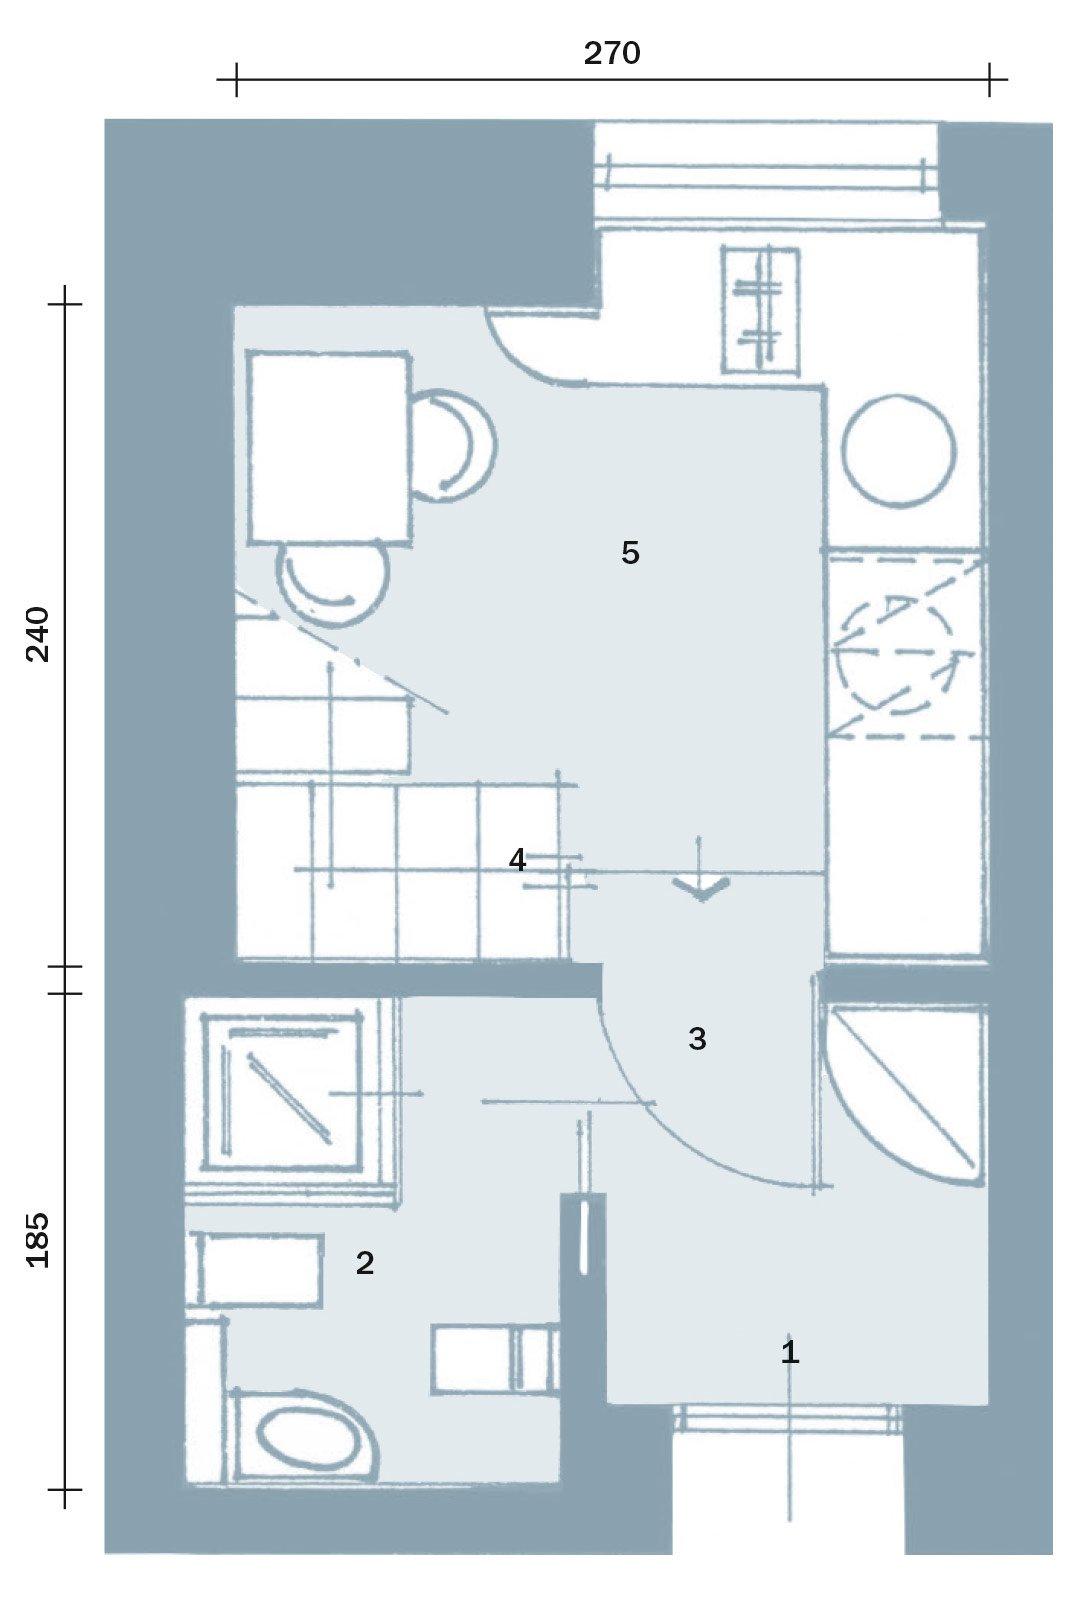 Emejing Dimensioni Mobili Cucina Gallery - Home Ideas - tyger.us